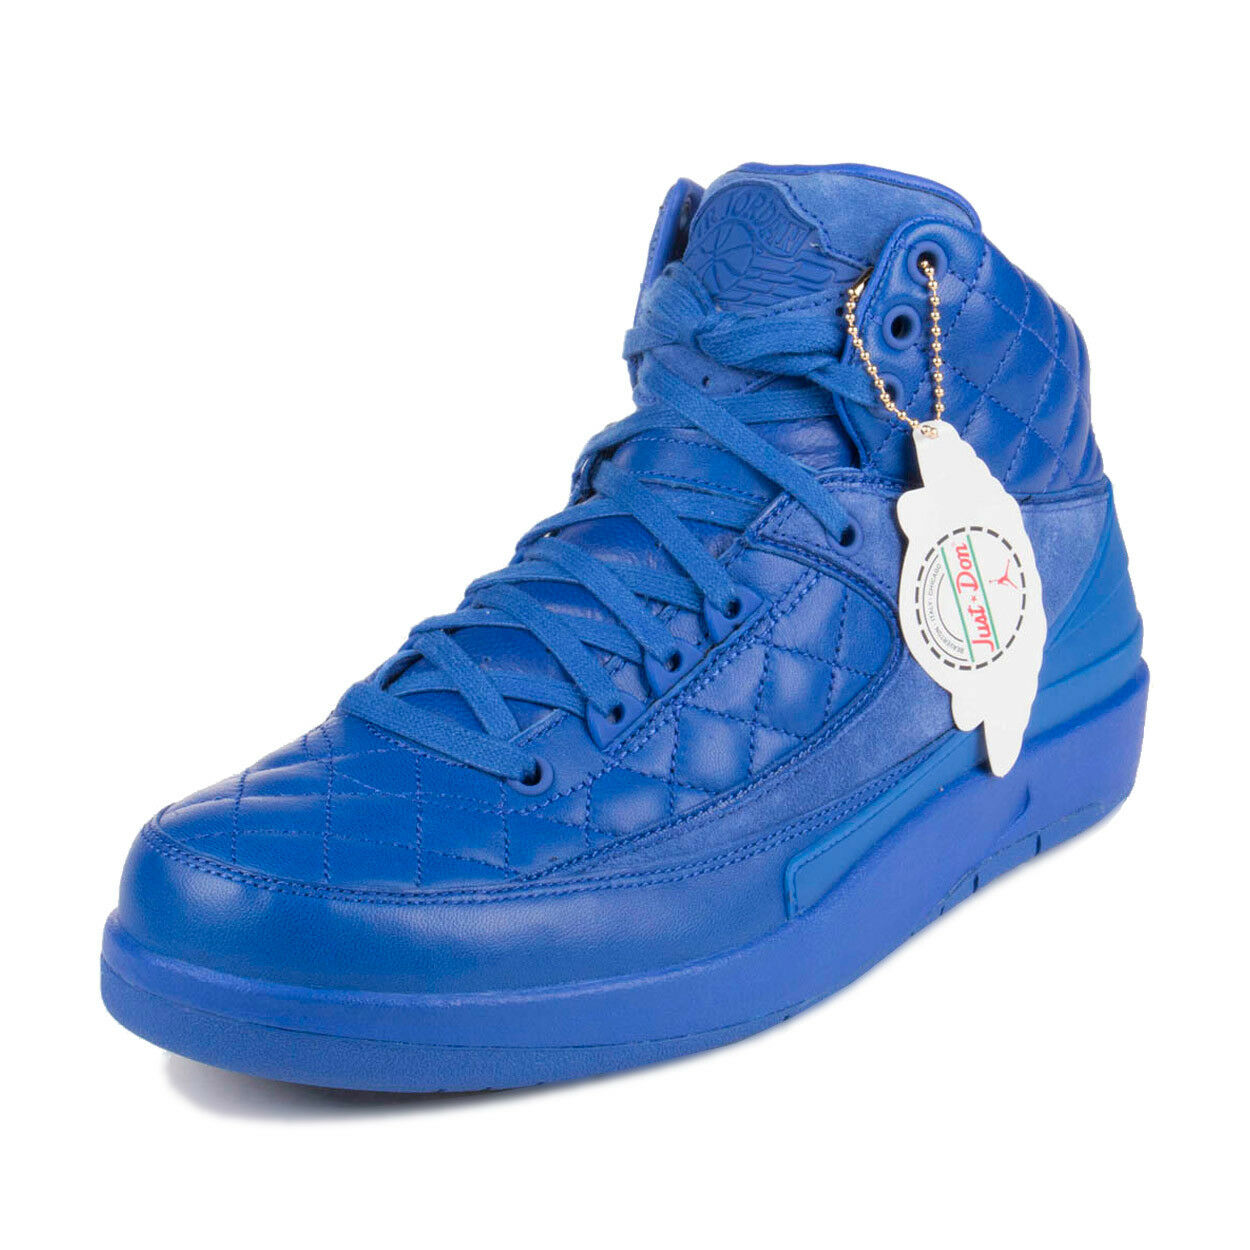 Nike Para Hombre Jordan 2 Retro